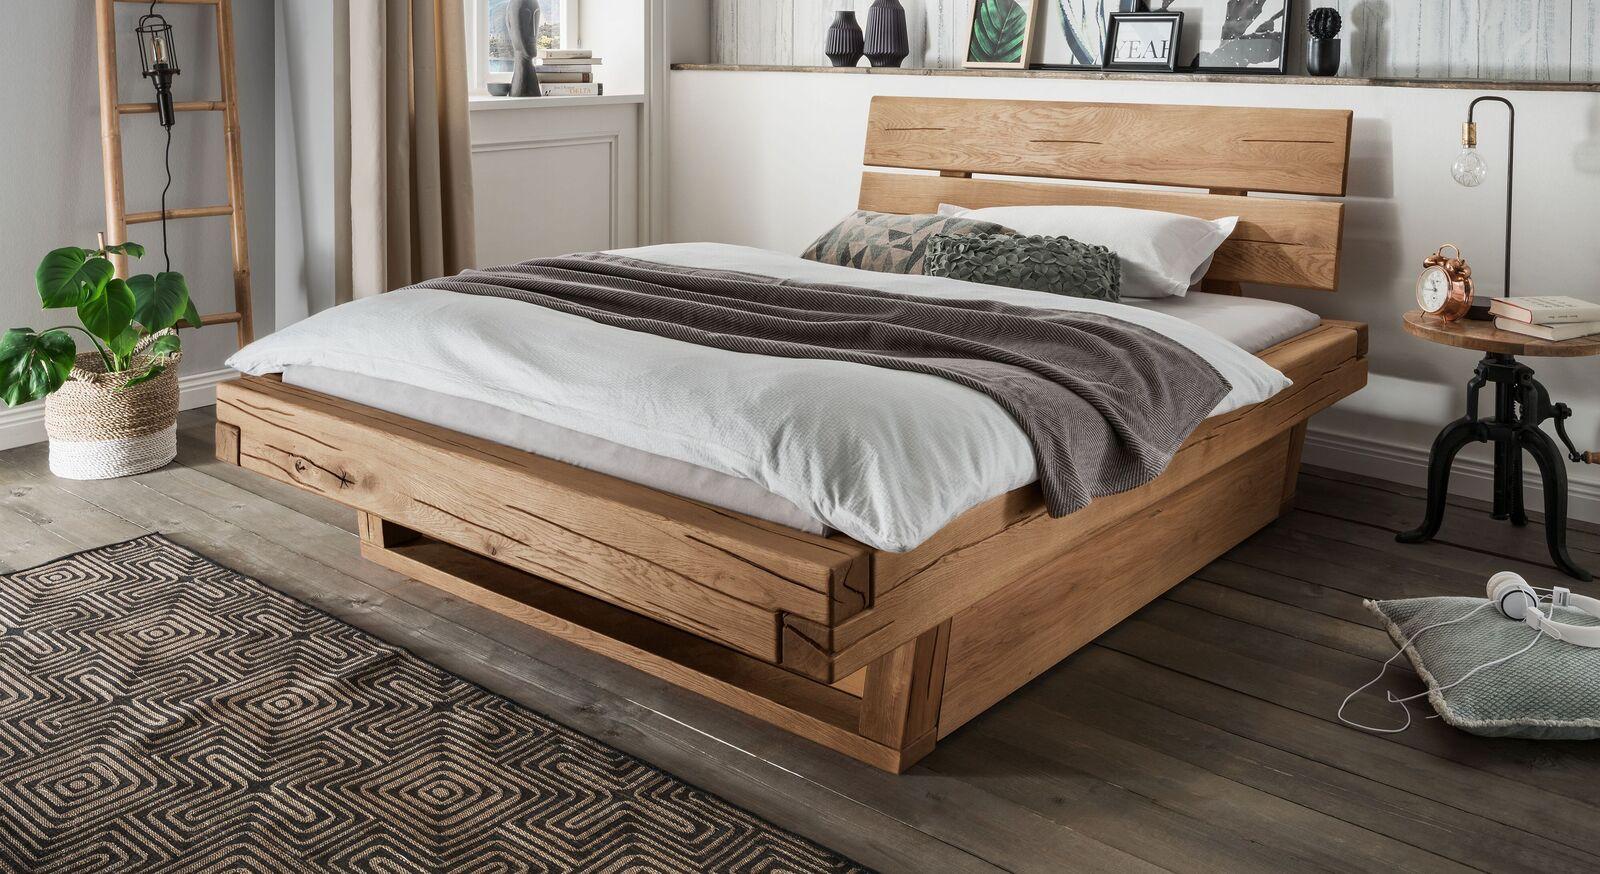 Schubkastenbett Romeno in 140x200 cm aus rustikalem Echtholz